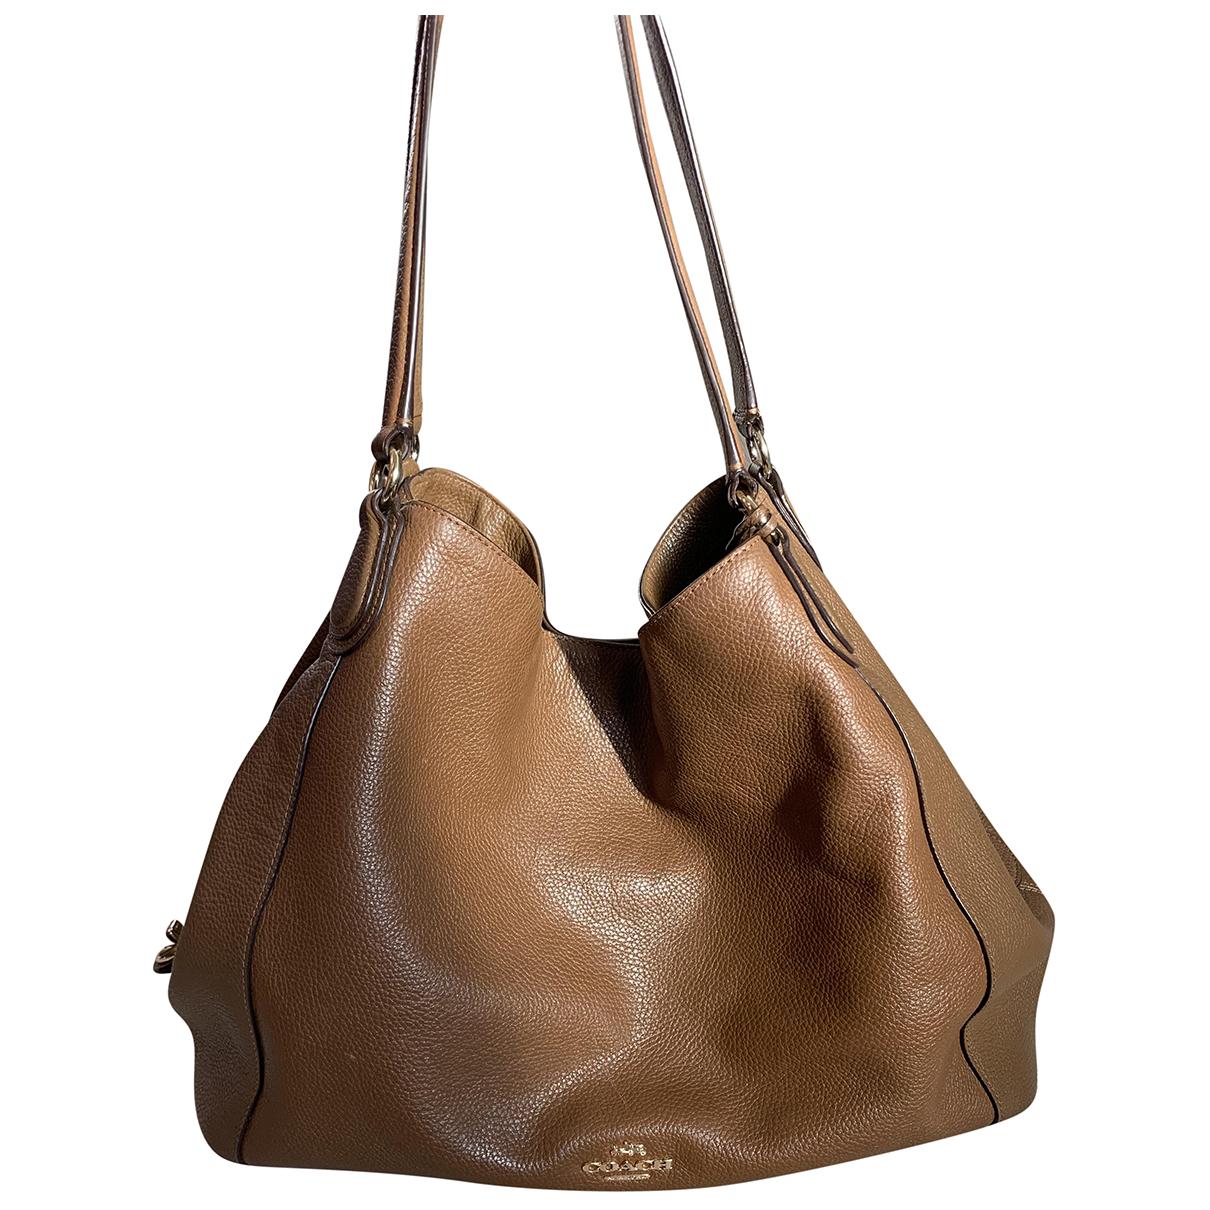 Coach Edie Brown Leather Handbags